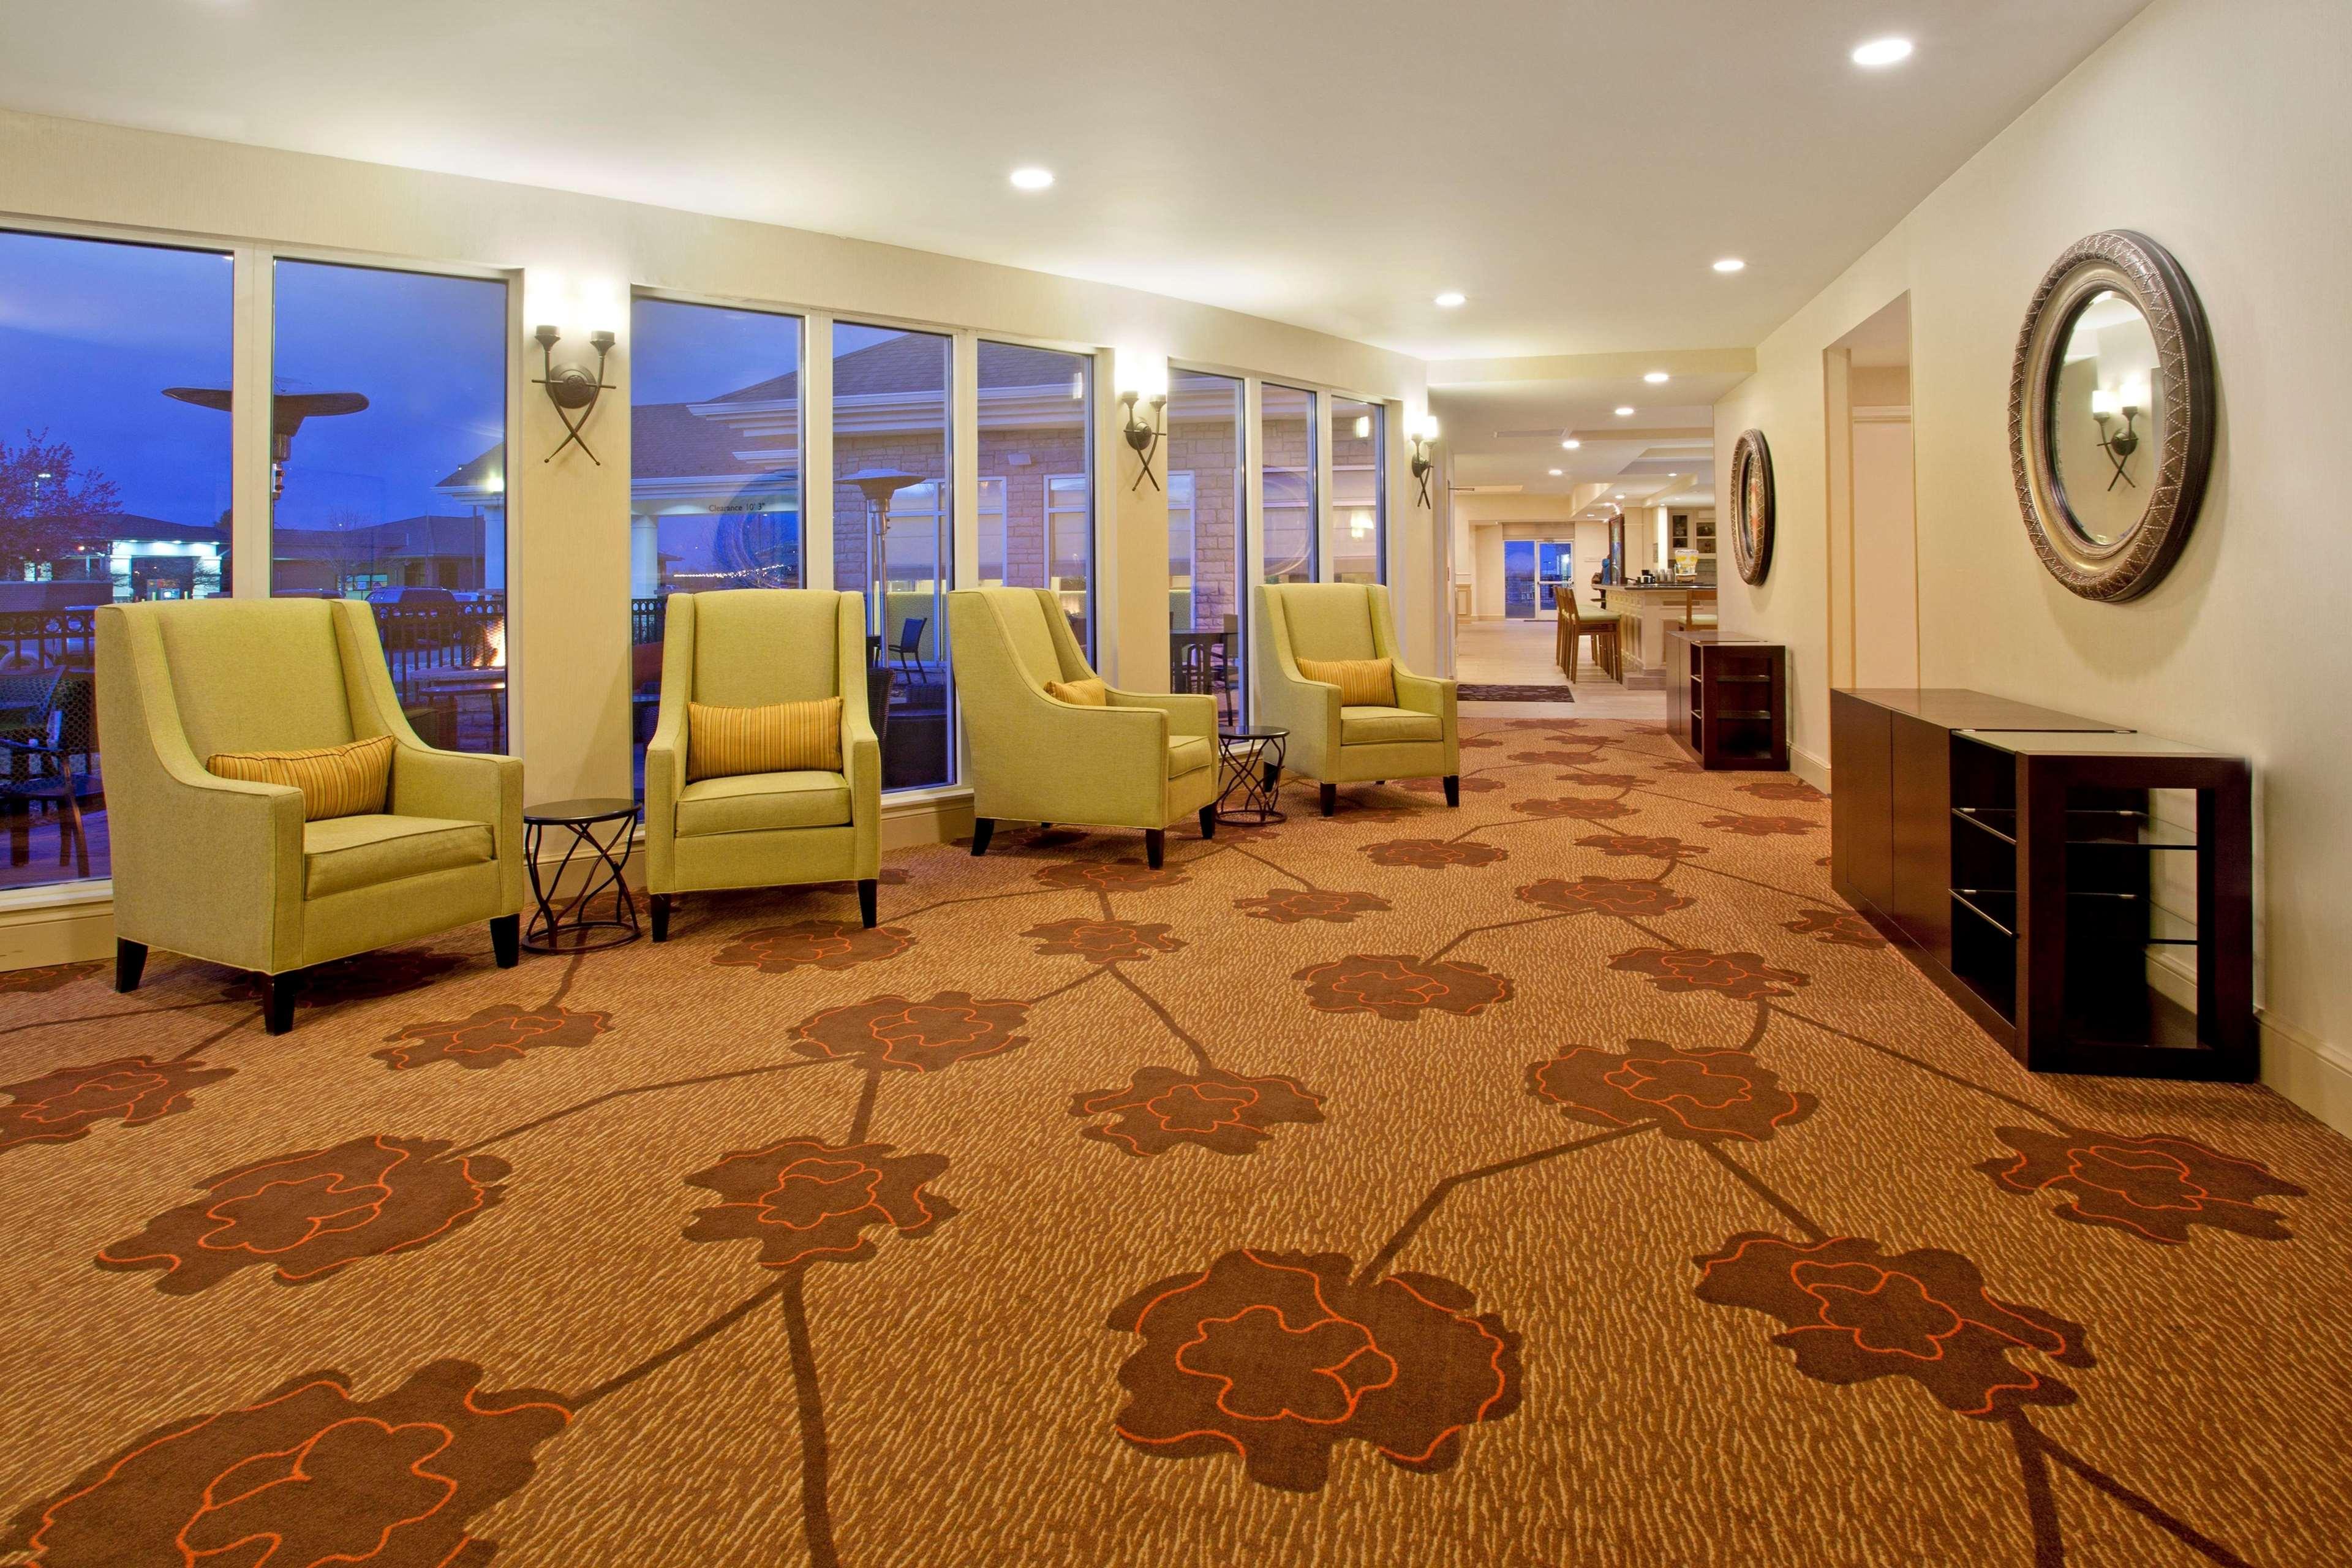 Hilton Garden Inn Fort Collins image 31